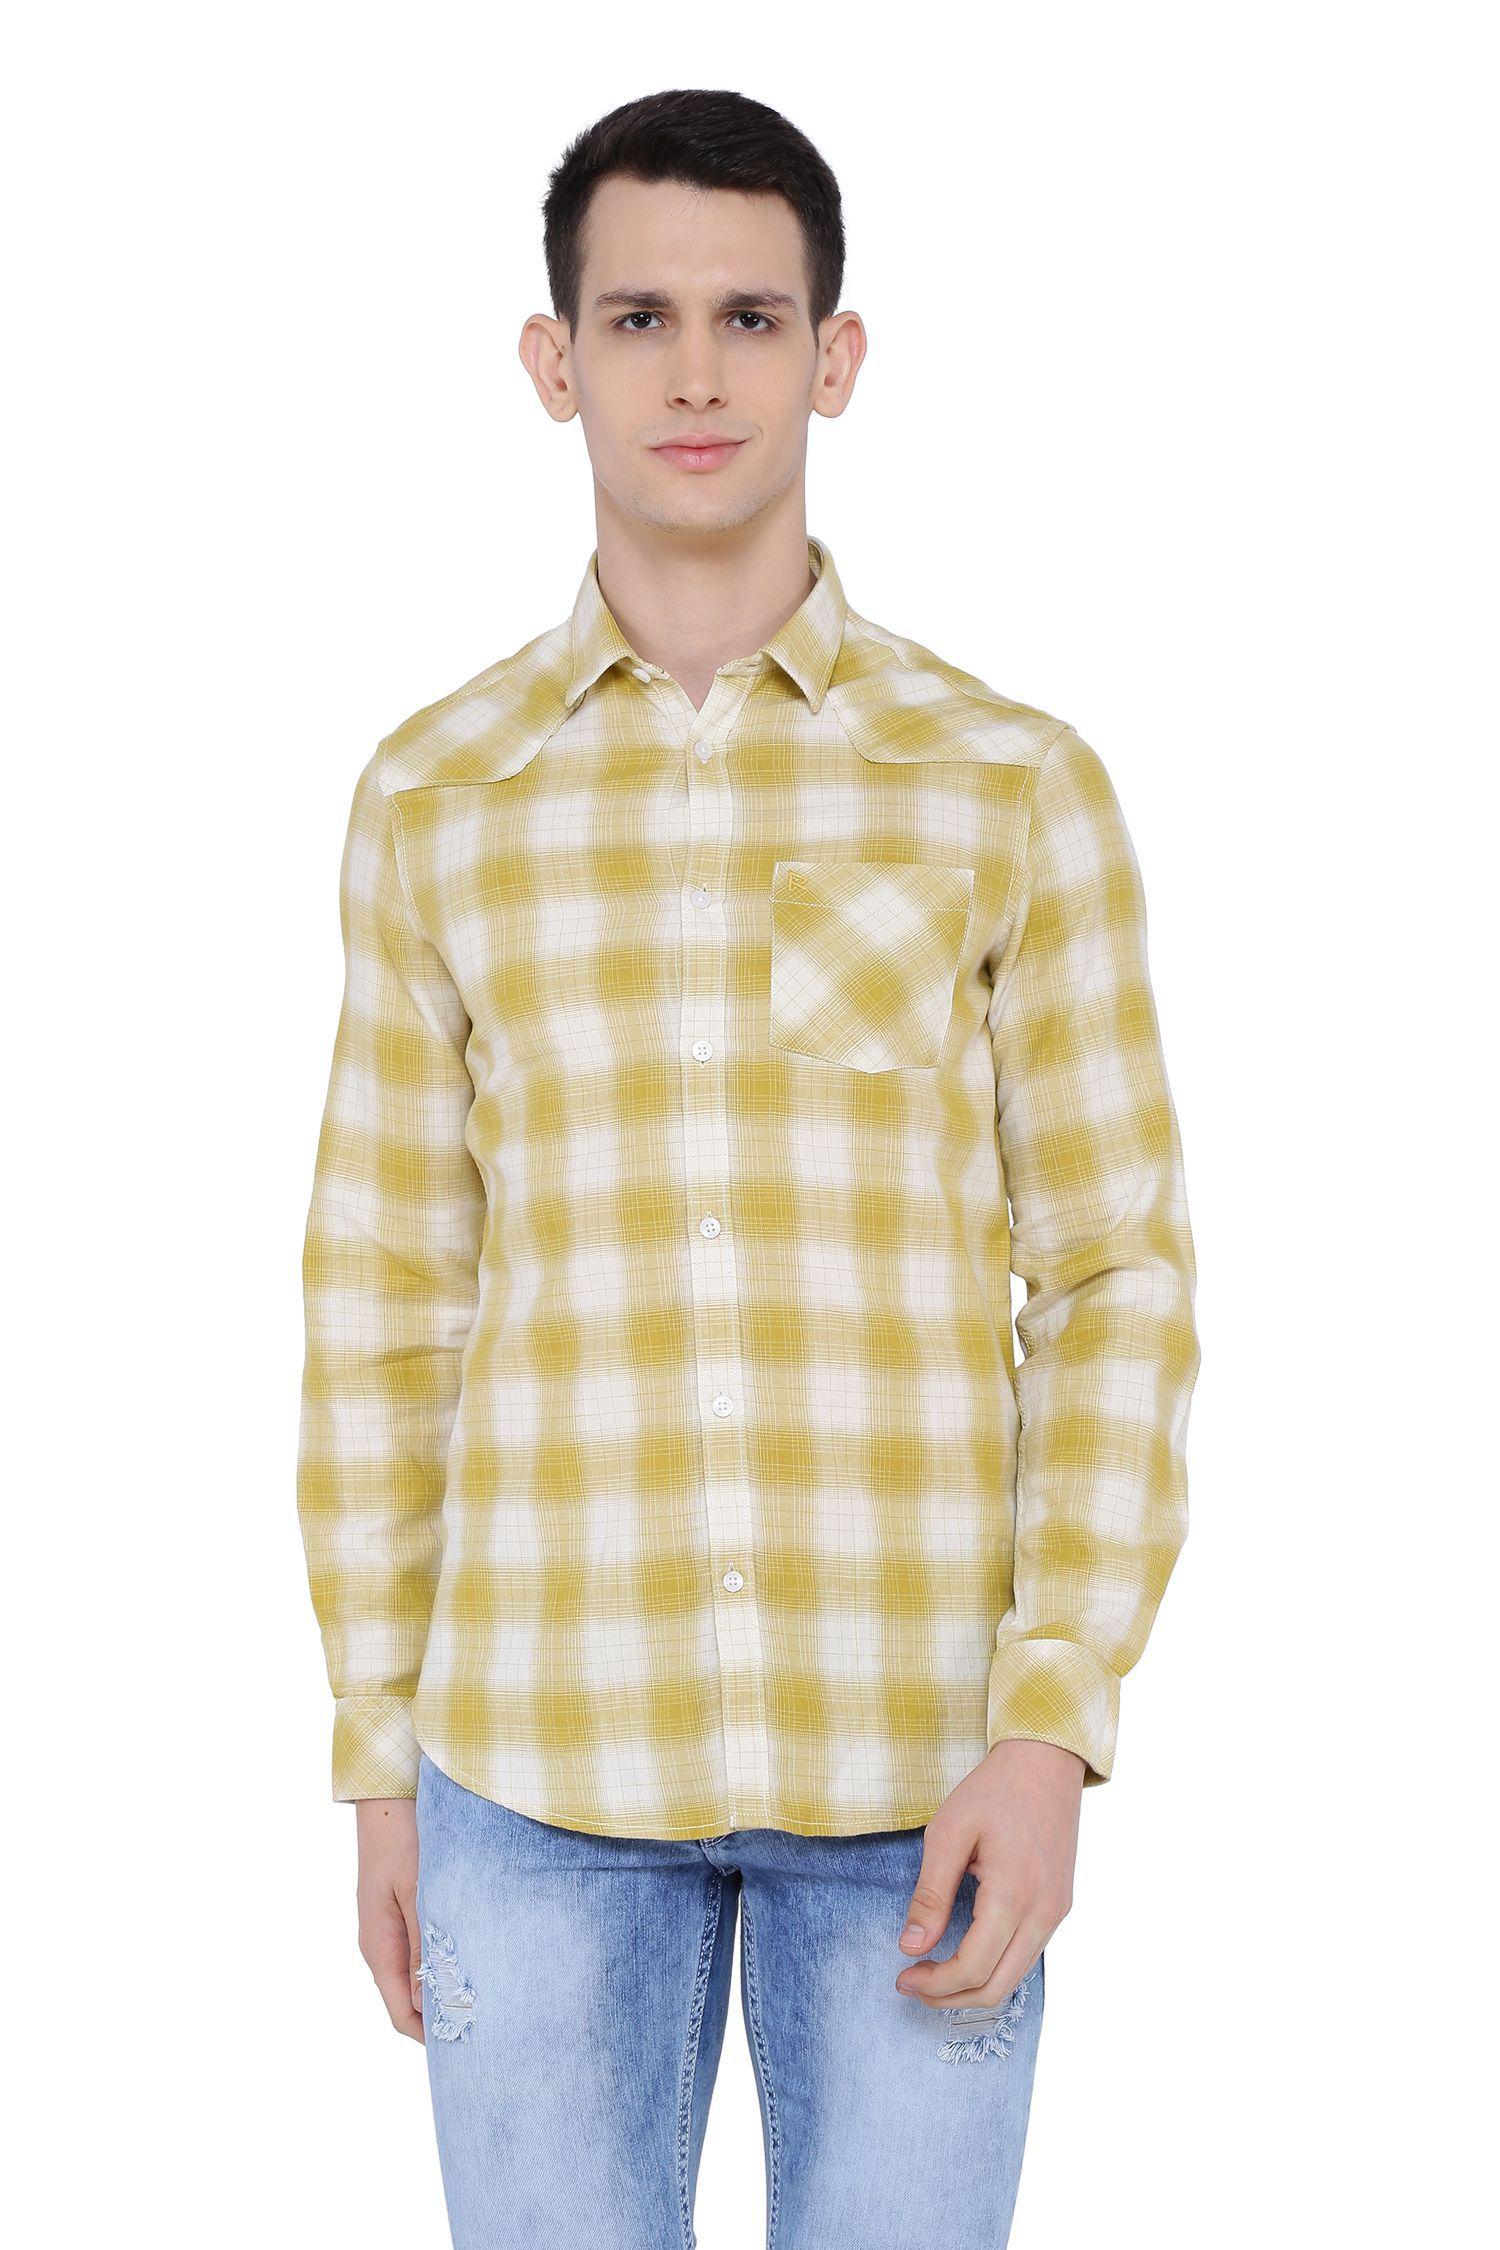 Risque 100 Percent Cotton Green Checks Shirt